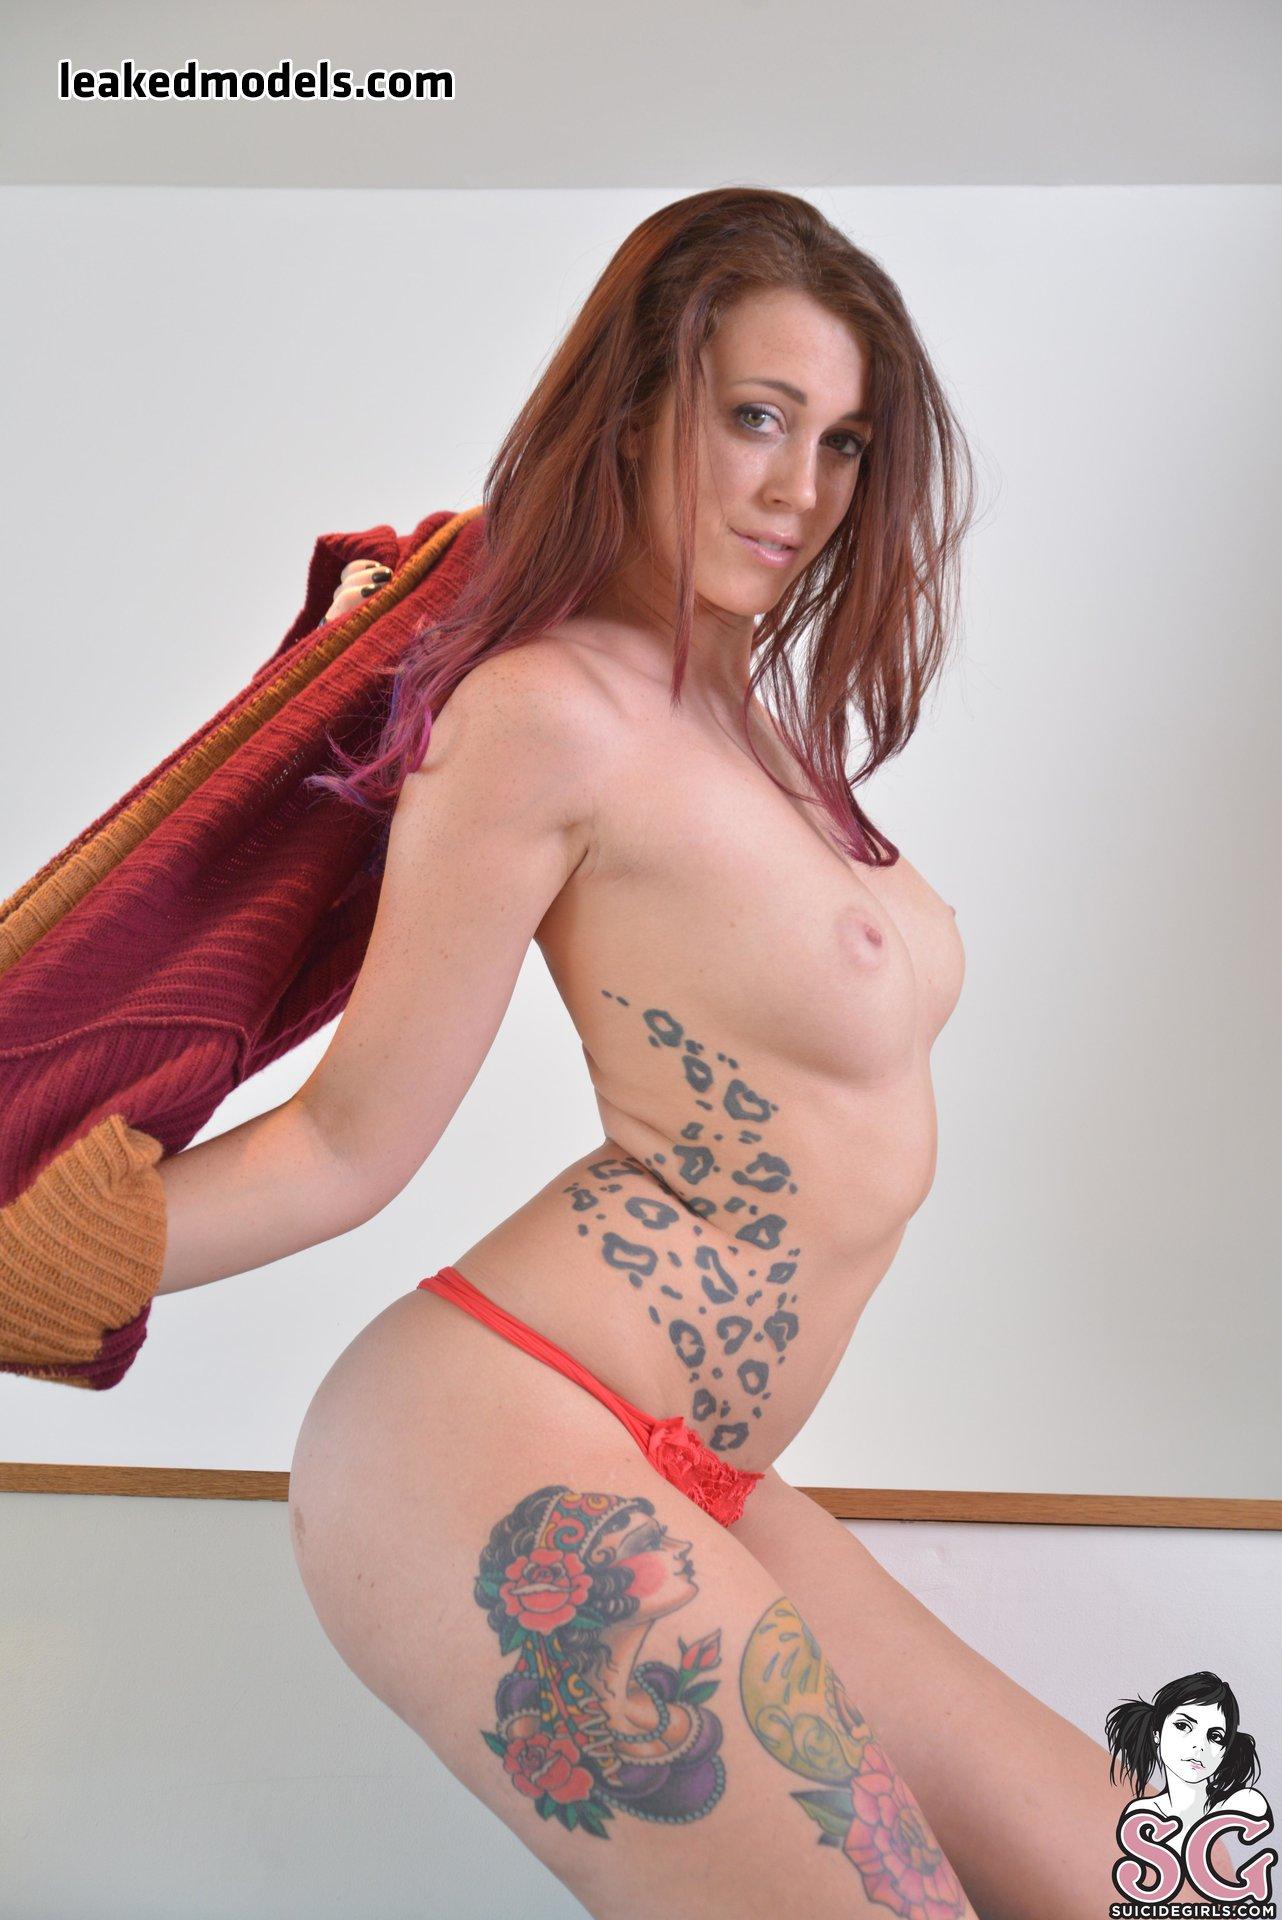 Charlotte Herbert – CharSomething OnlyFans Nude Leaks (27 Photos)